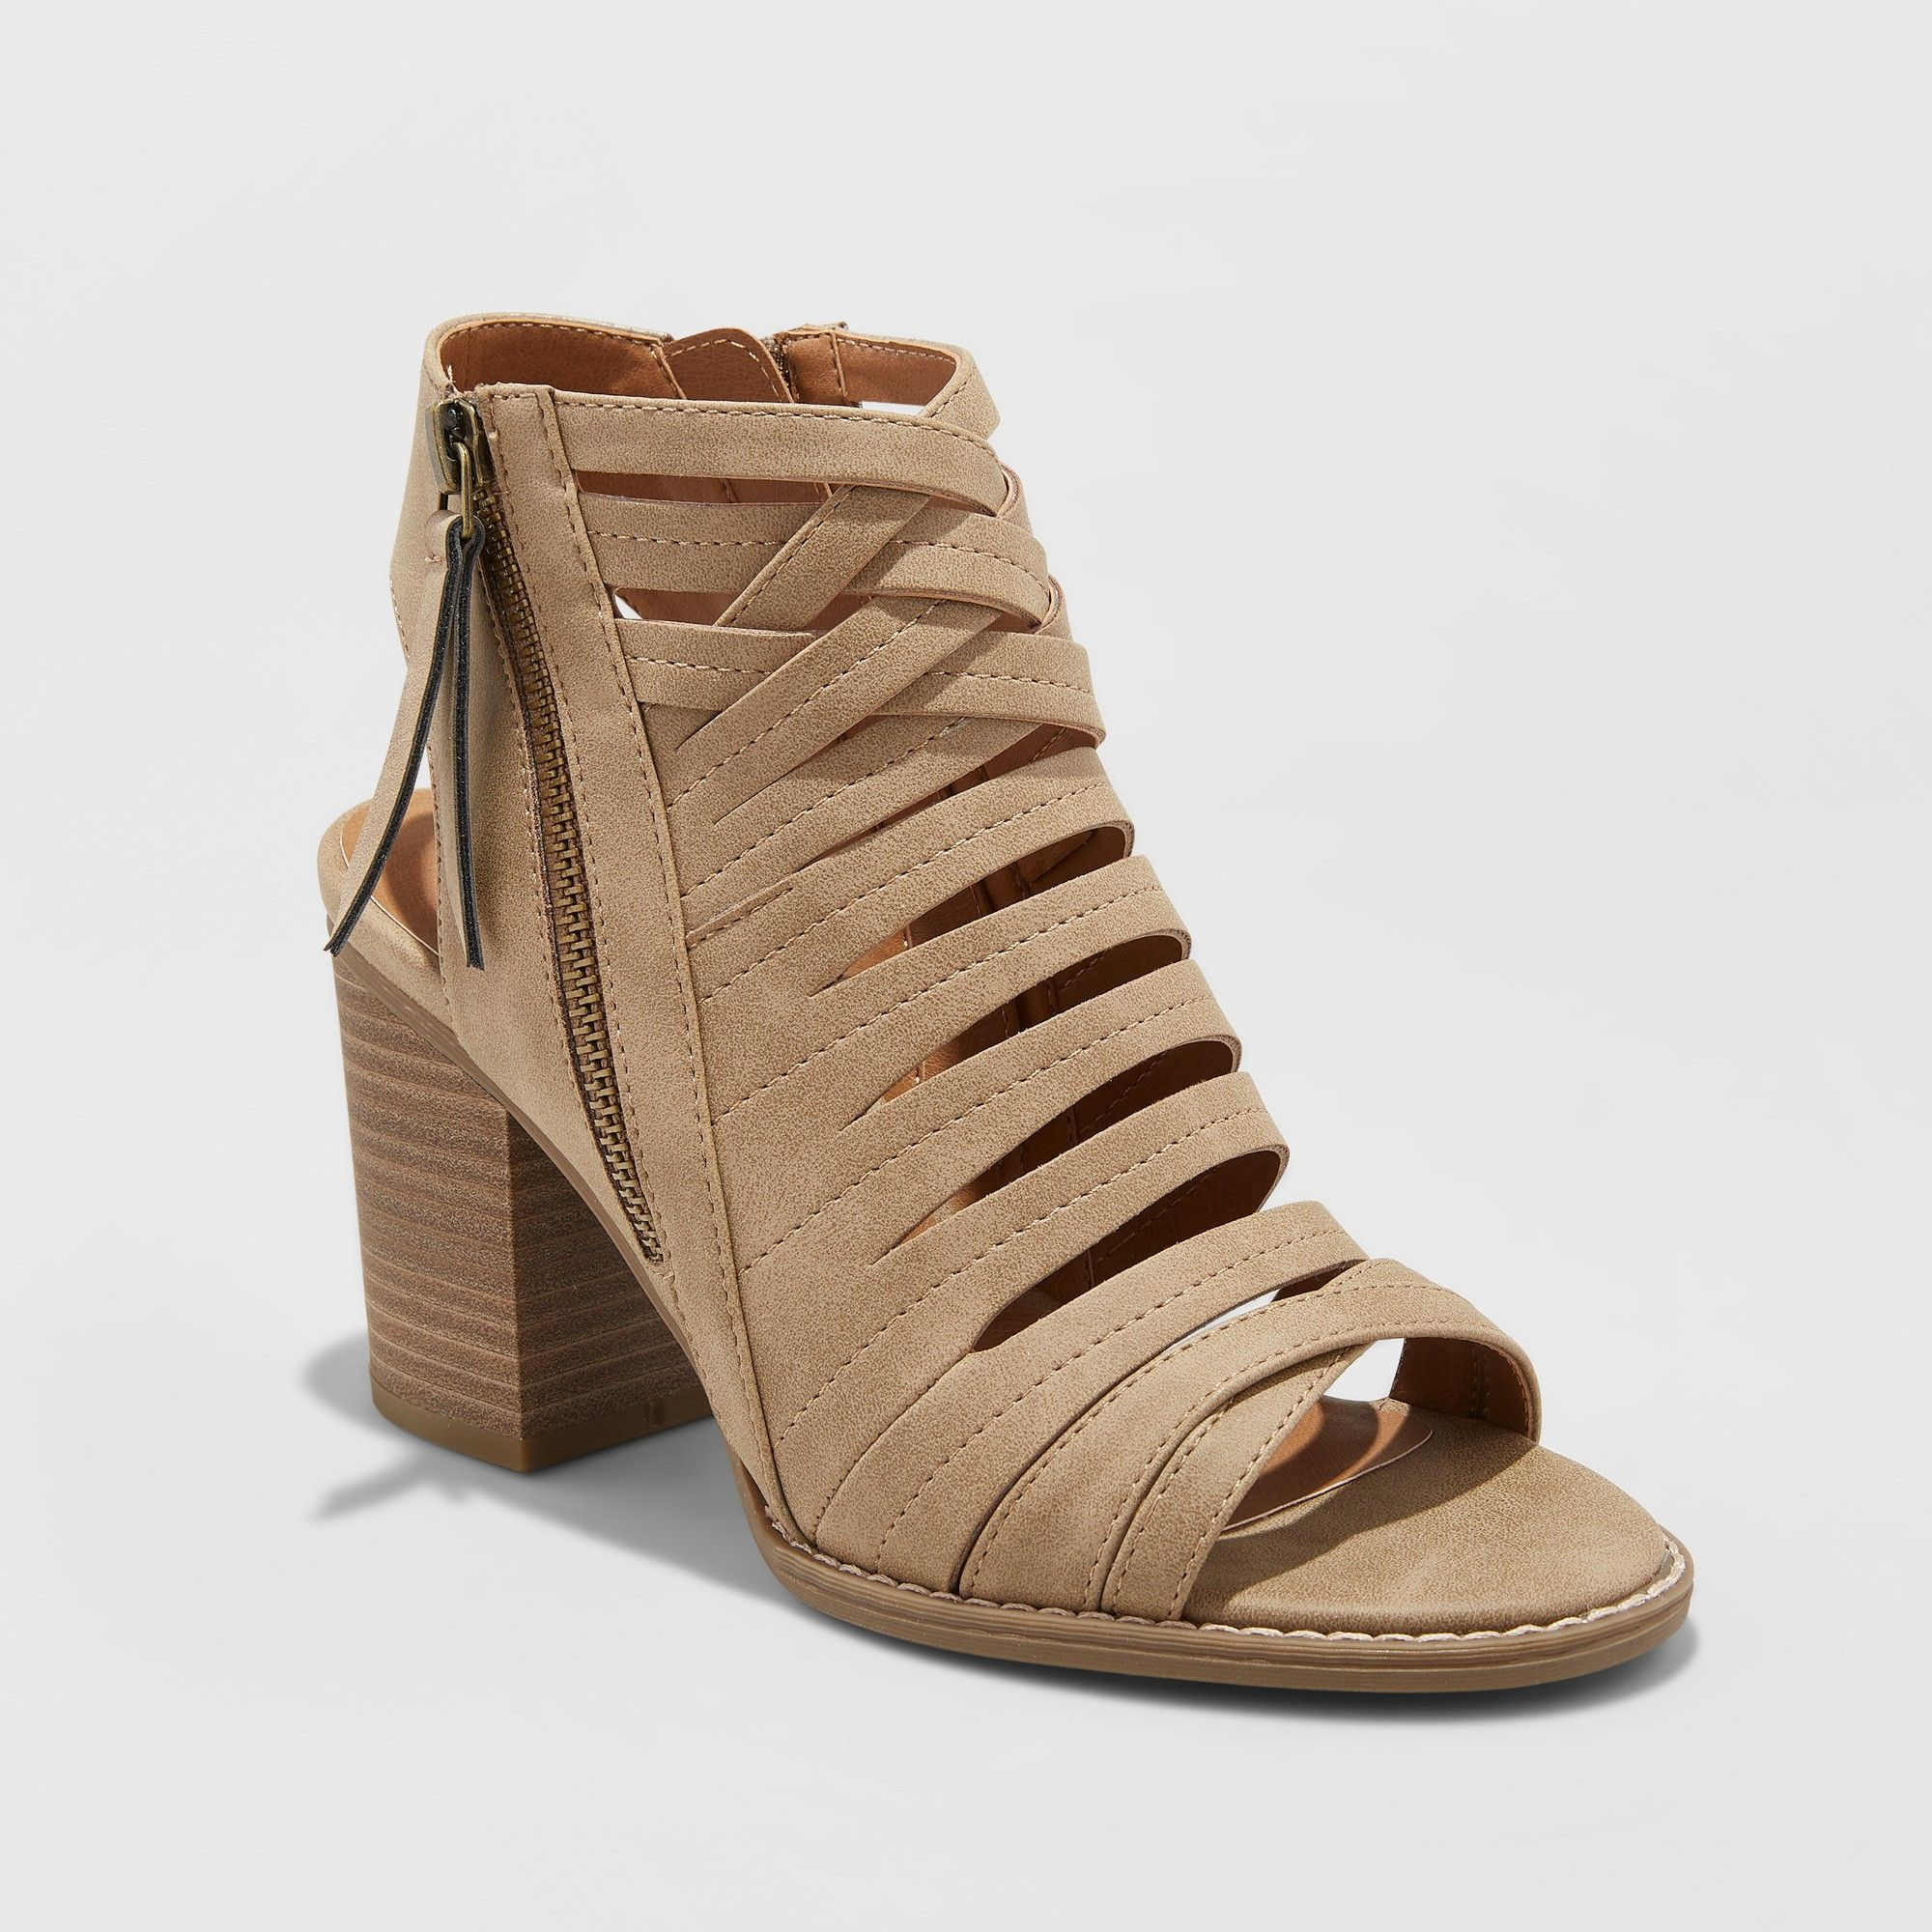 f34886460c7 Women s Elda Microsuede Wide Width Open Toe Heeled Pump Sandals - Universal  Thread Taupe (Brown) 10W